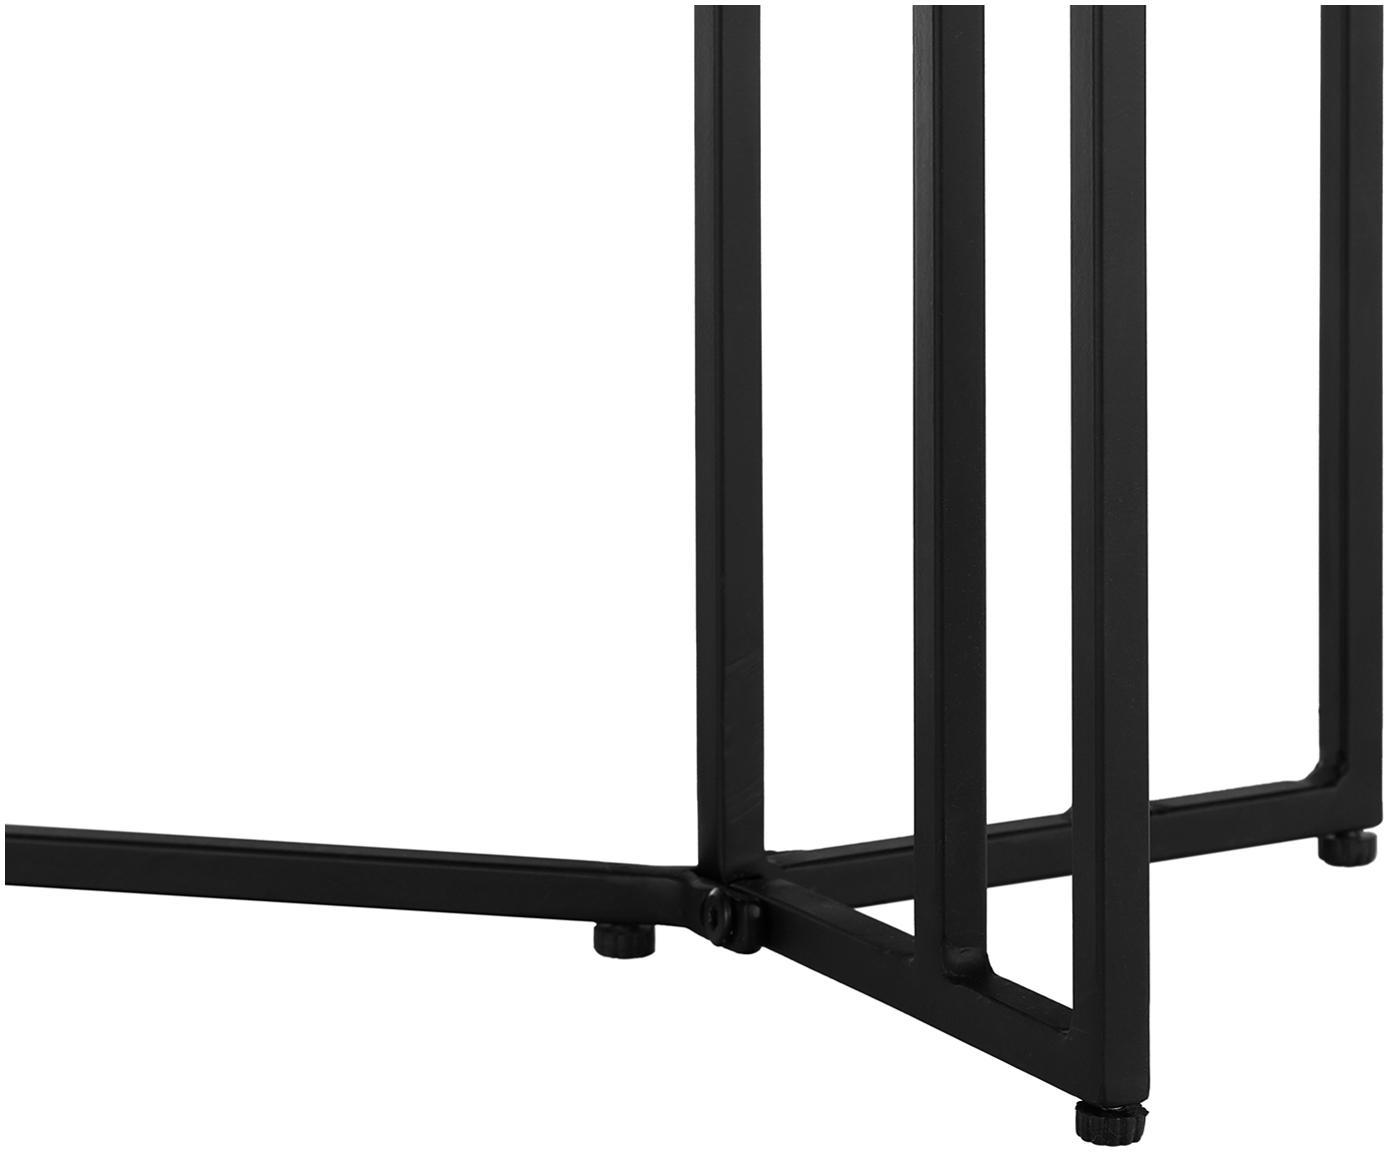 Konsole Luca mit Massivholzplatte, Ablagefläche: Massives Mangoholz, gebür, Gestell: Metall, pulverbeschichtet, Ablagefläche: Schwarz, lackiertGestell: Schwarz, matt, 100 x 80 cm